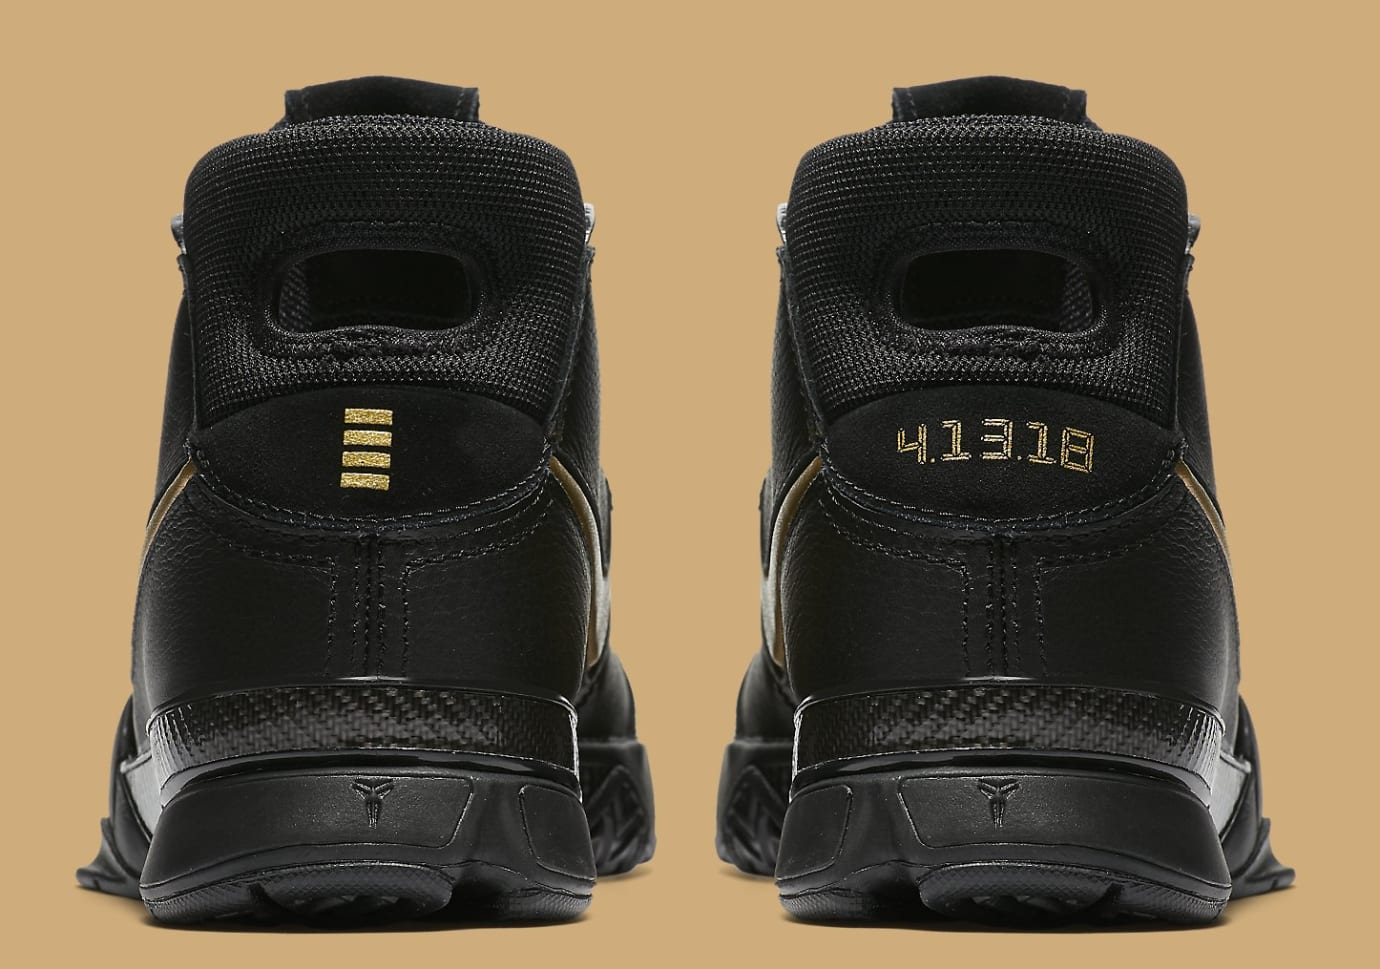 8889a0b6fd16 Image via Nike Nike Kobe 1 Protro  Mamba Day  AQ2728-002 (Heel)